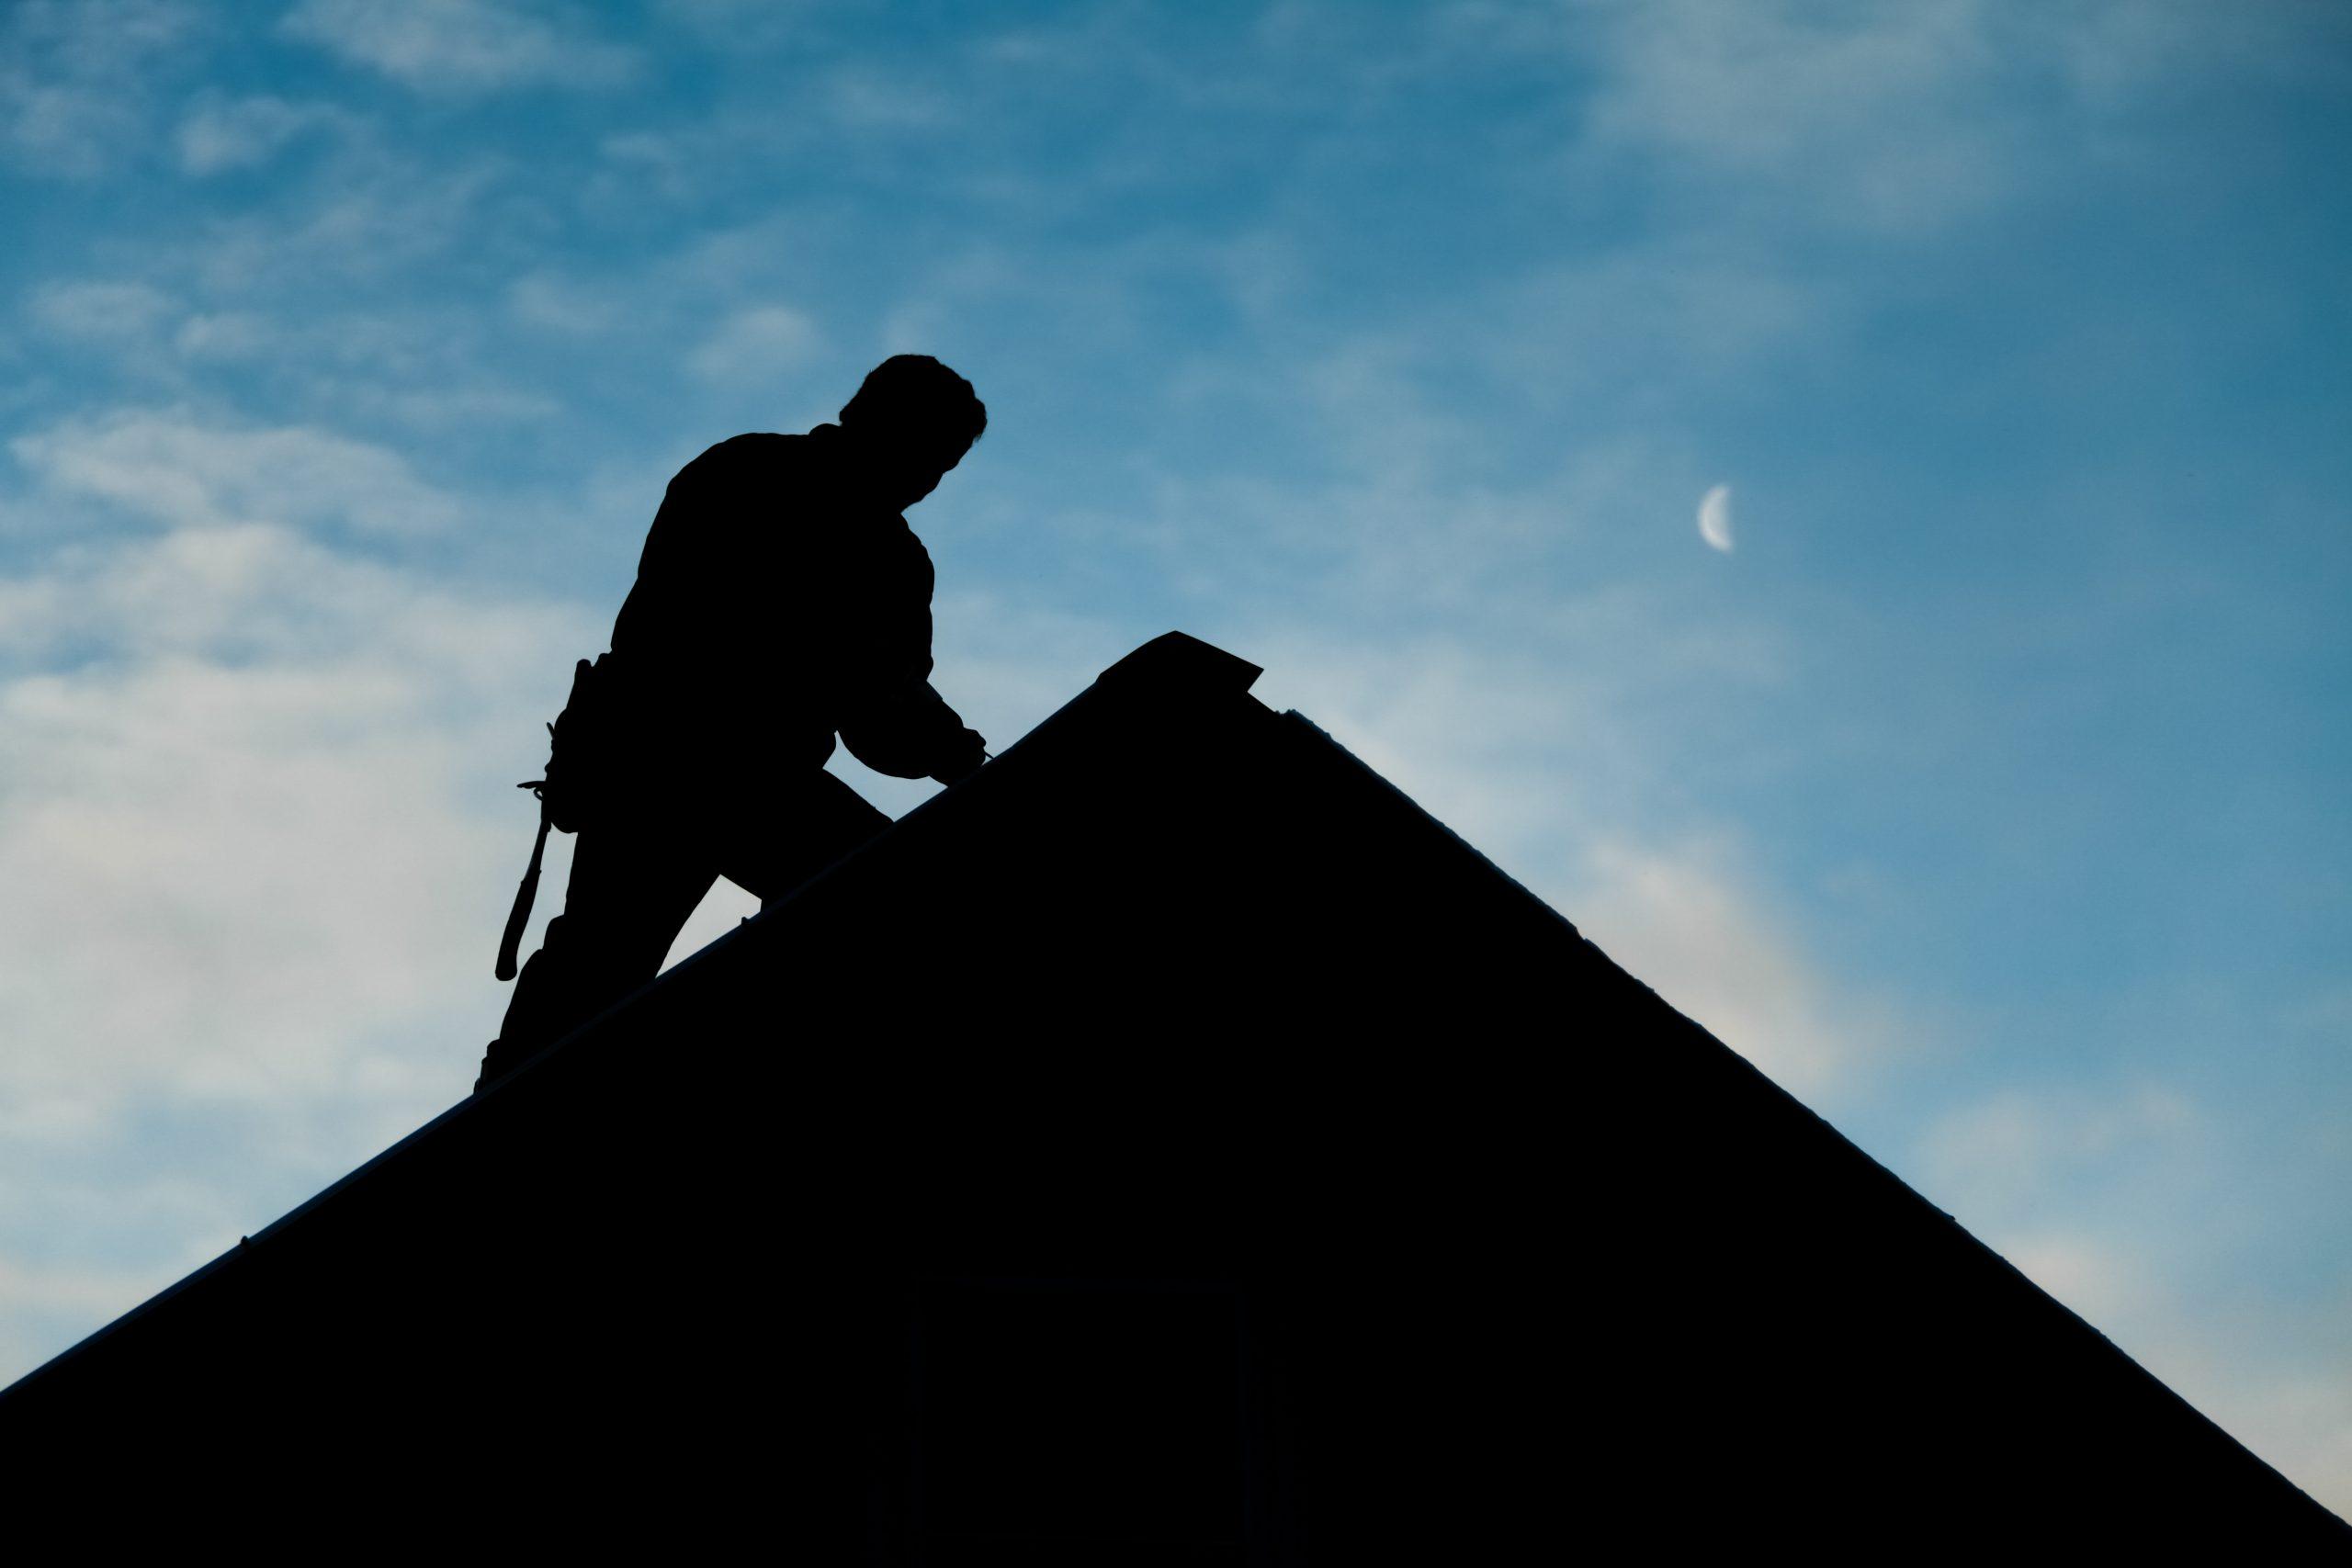 san antonio roofing supply